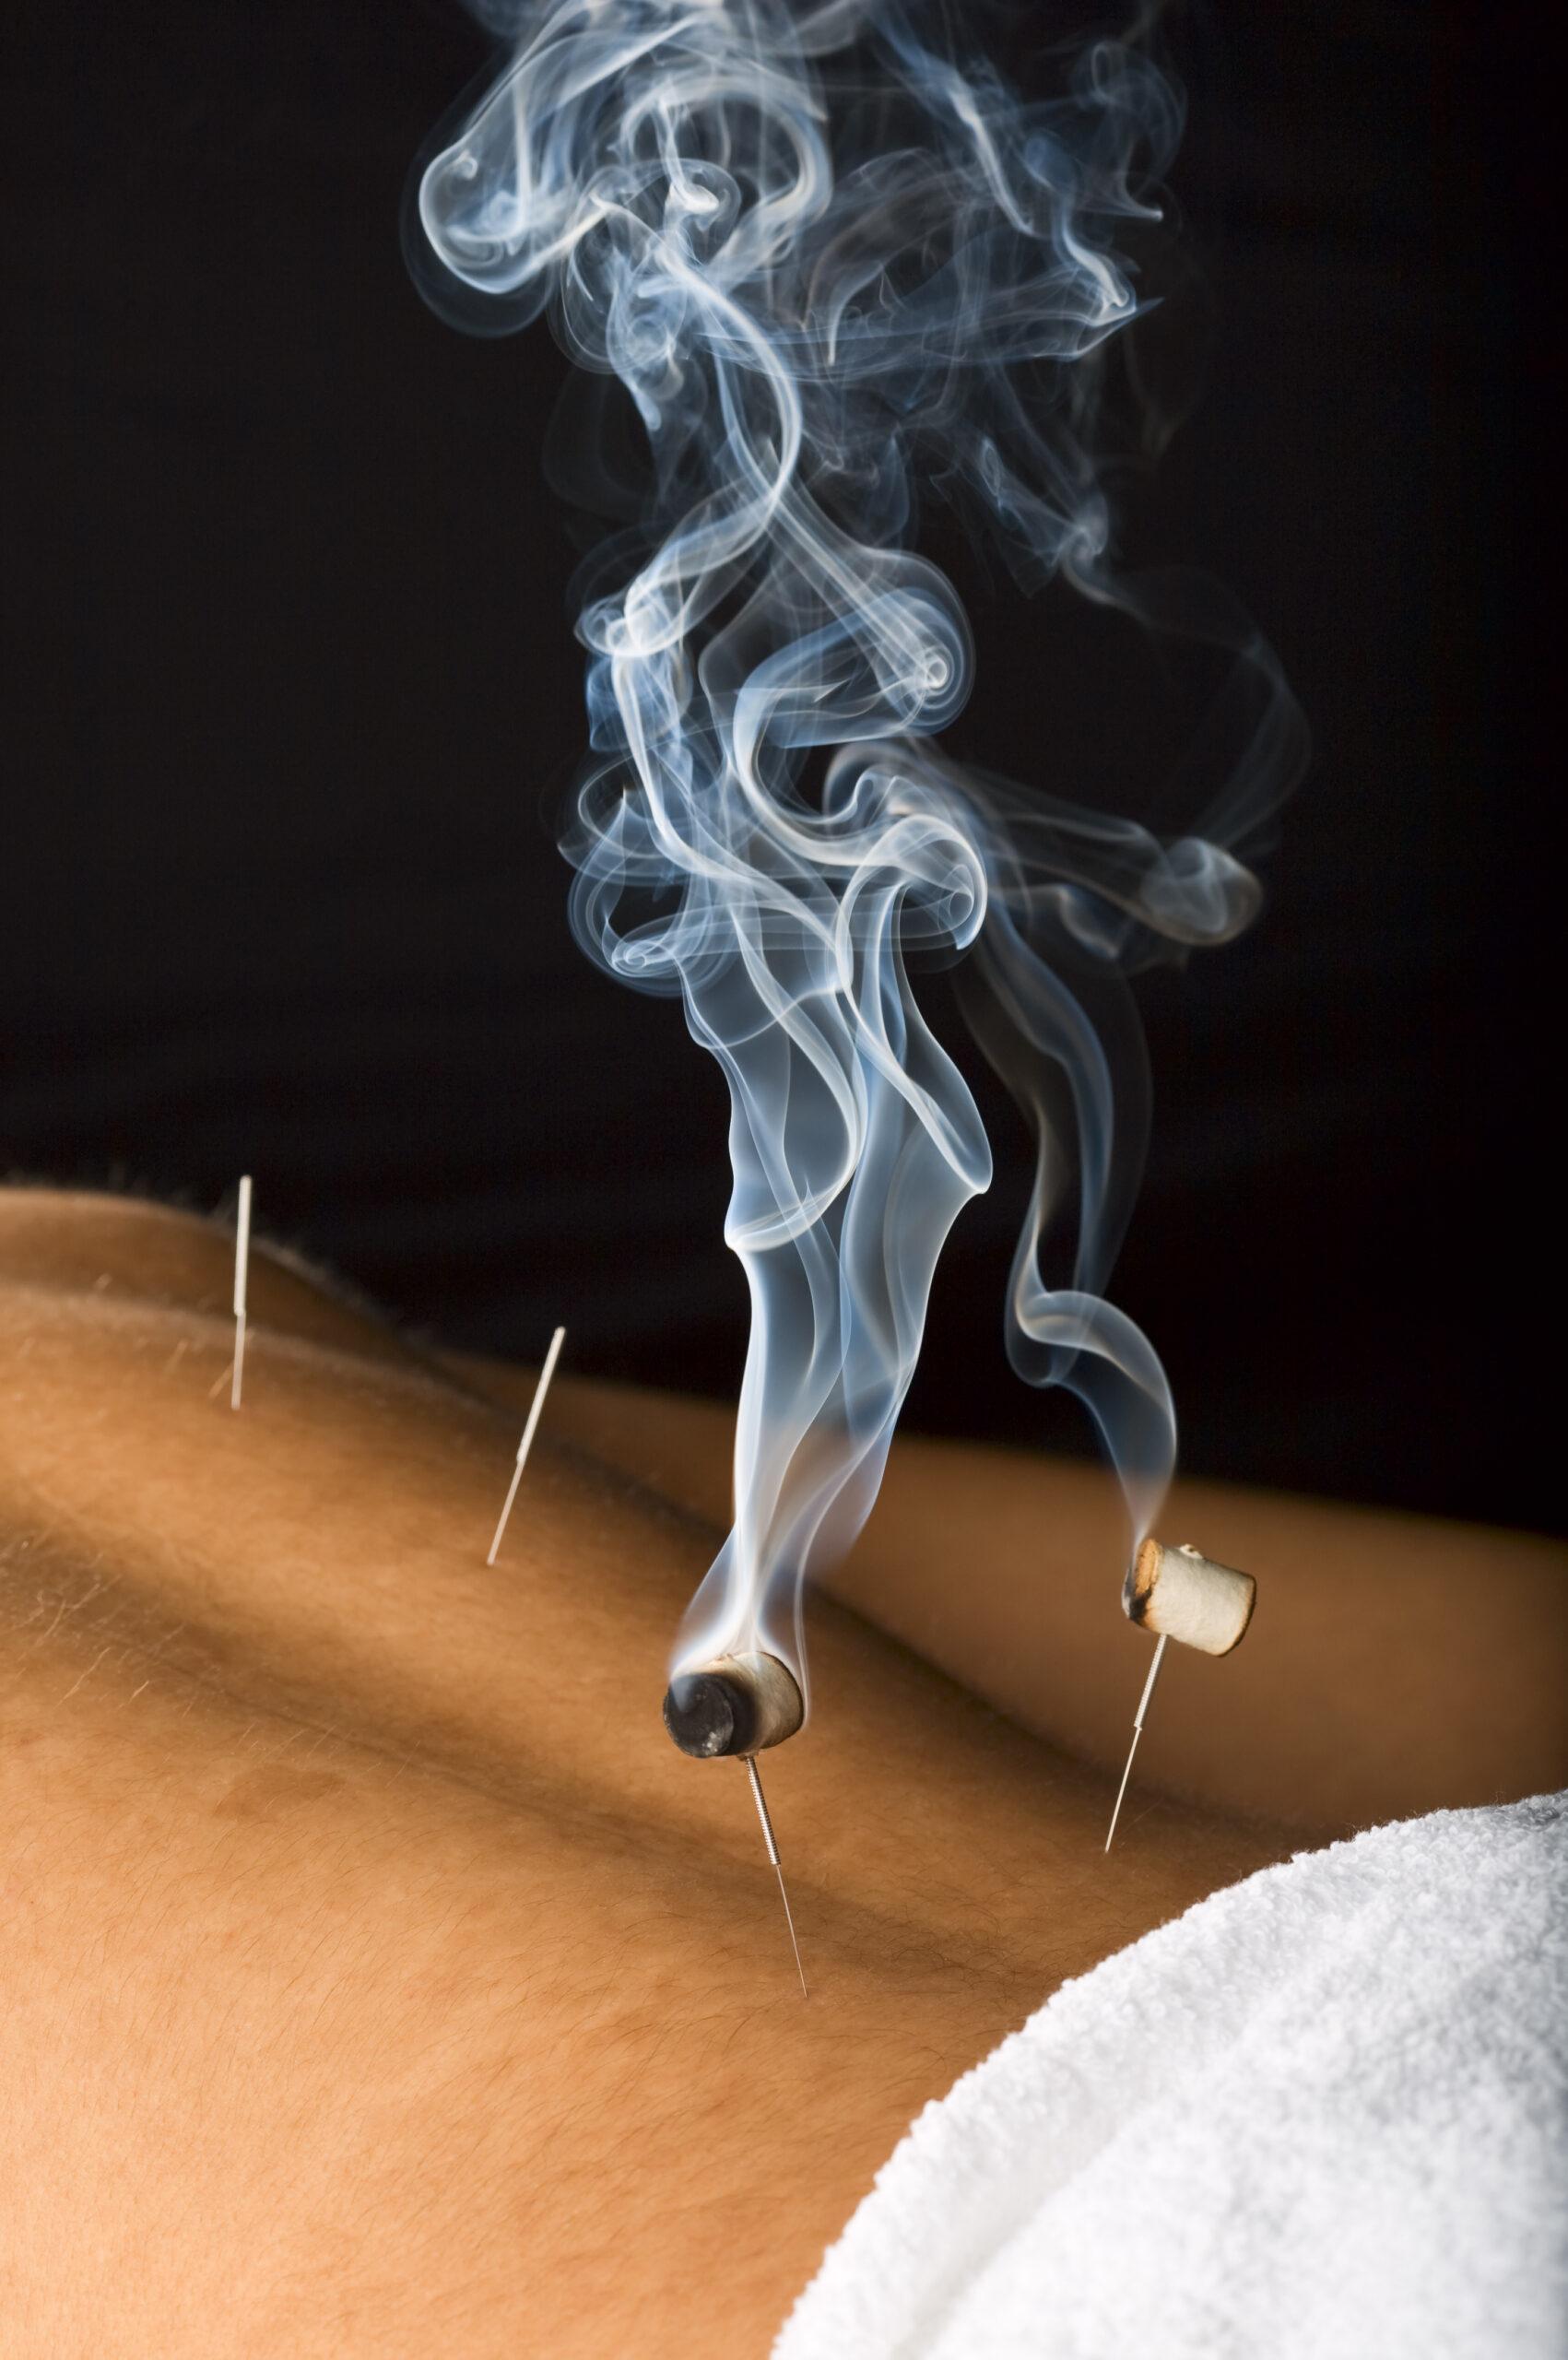 Traditionelle Chinesische Medizin Praxis Lucas in Husum